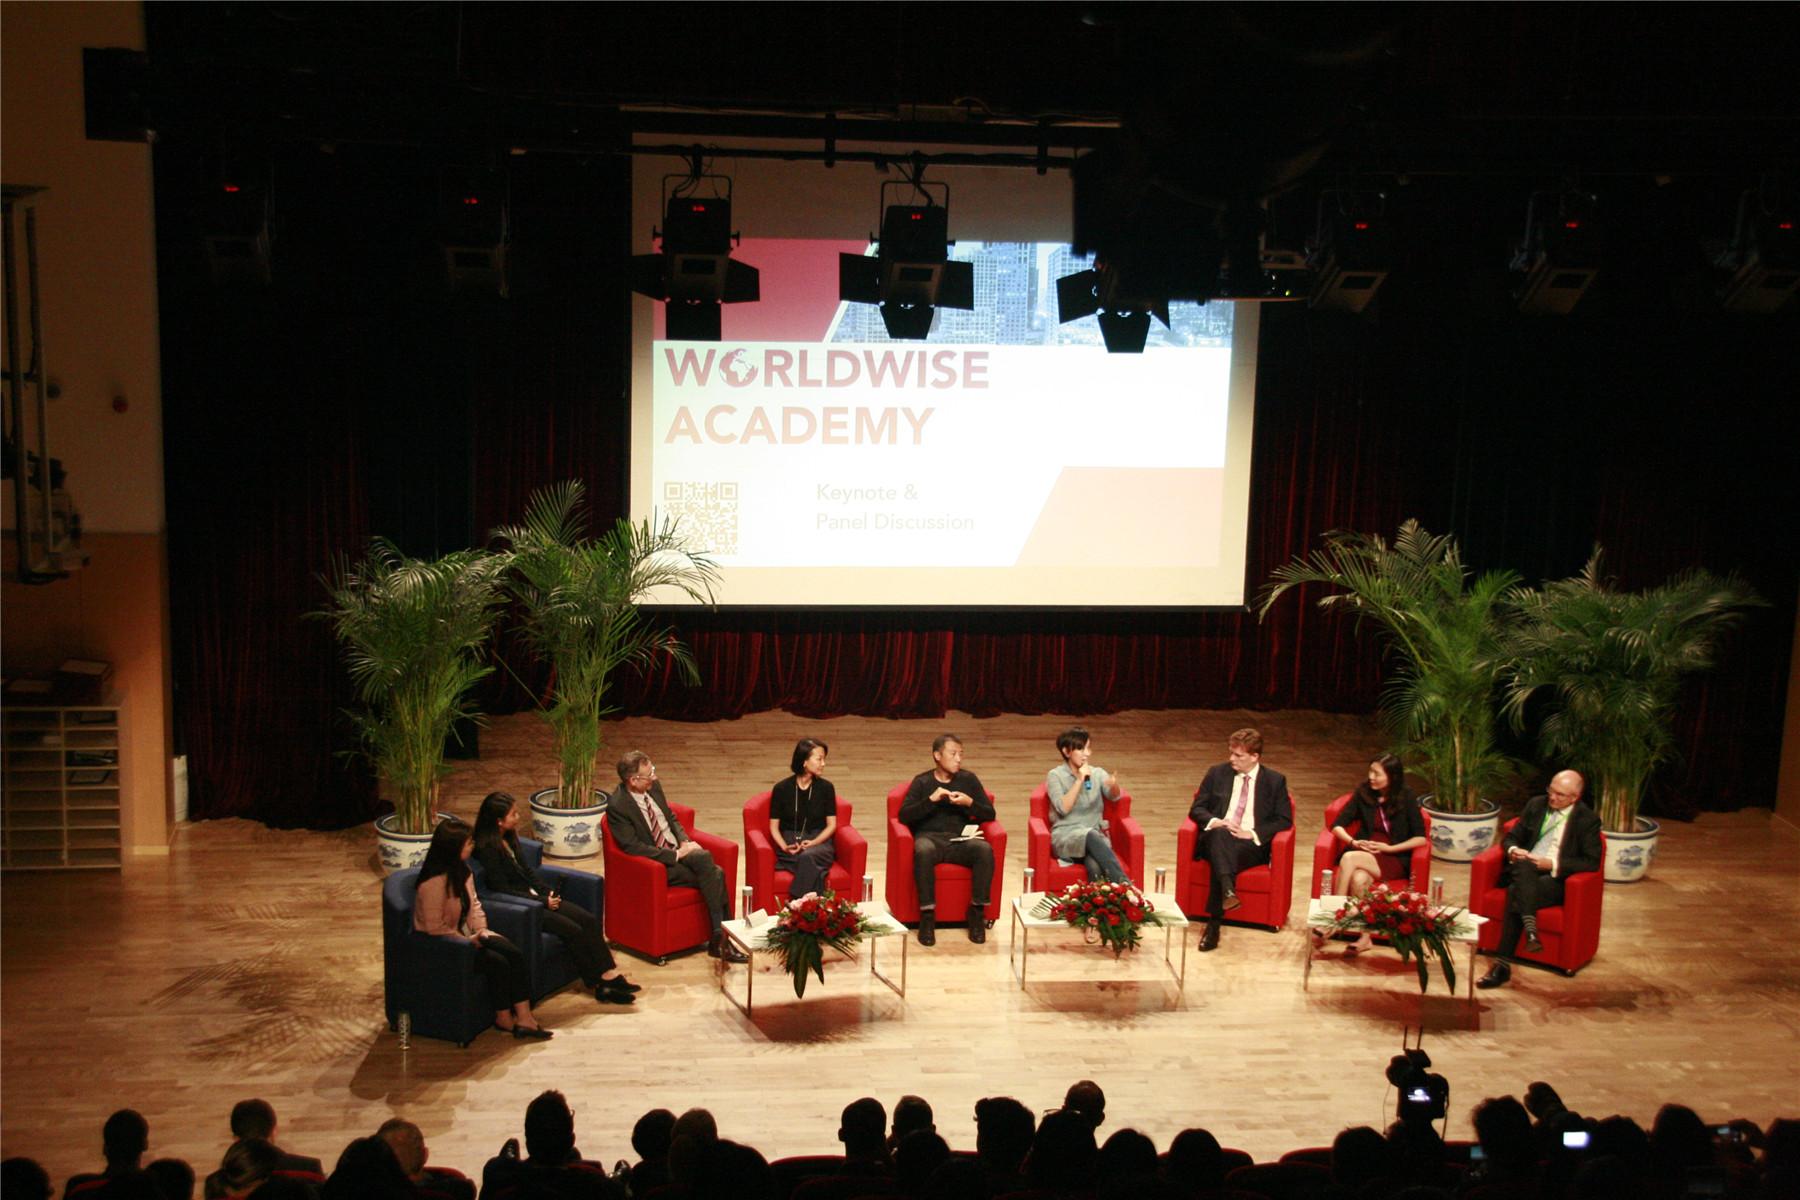 worldwise-academy-launchjpg-北京德威英国国际学校-20200811-133423-285